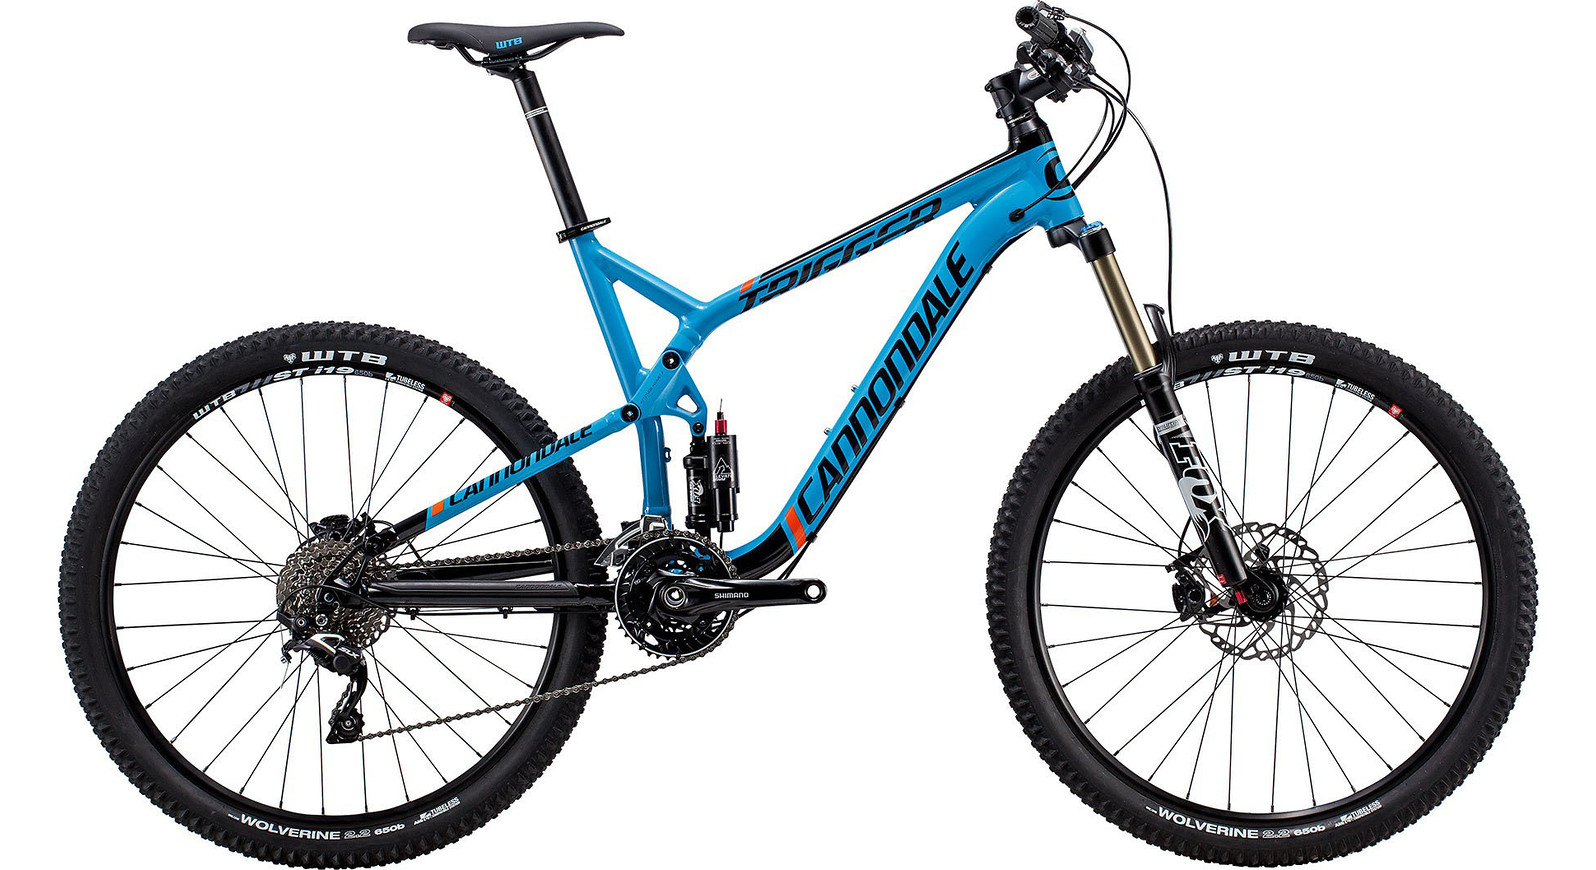 2015 Cannondale Trigger 27.5 4 Bike